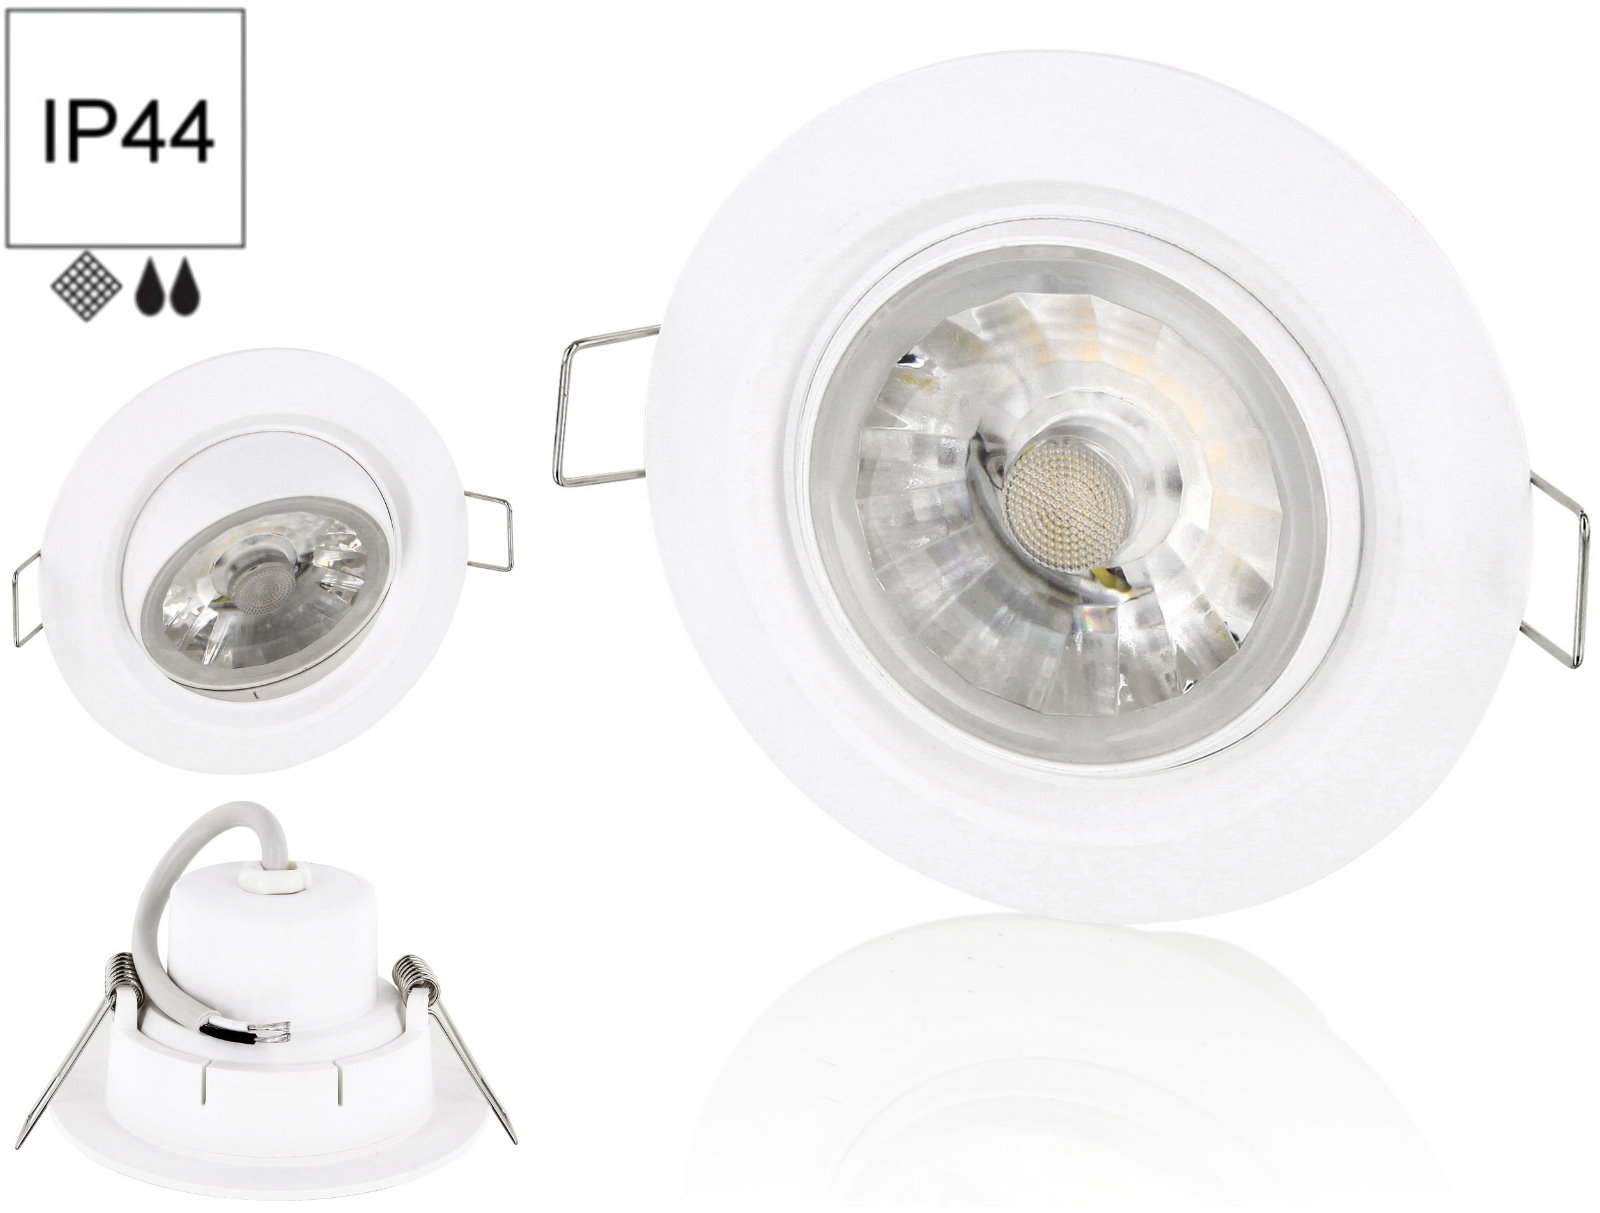 bioledex-dekto8W Fabelhafte Feuchtraum Led Einbaustrahler 230v Dekorationen